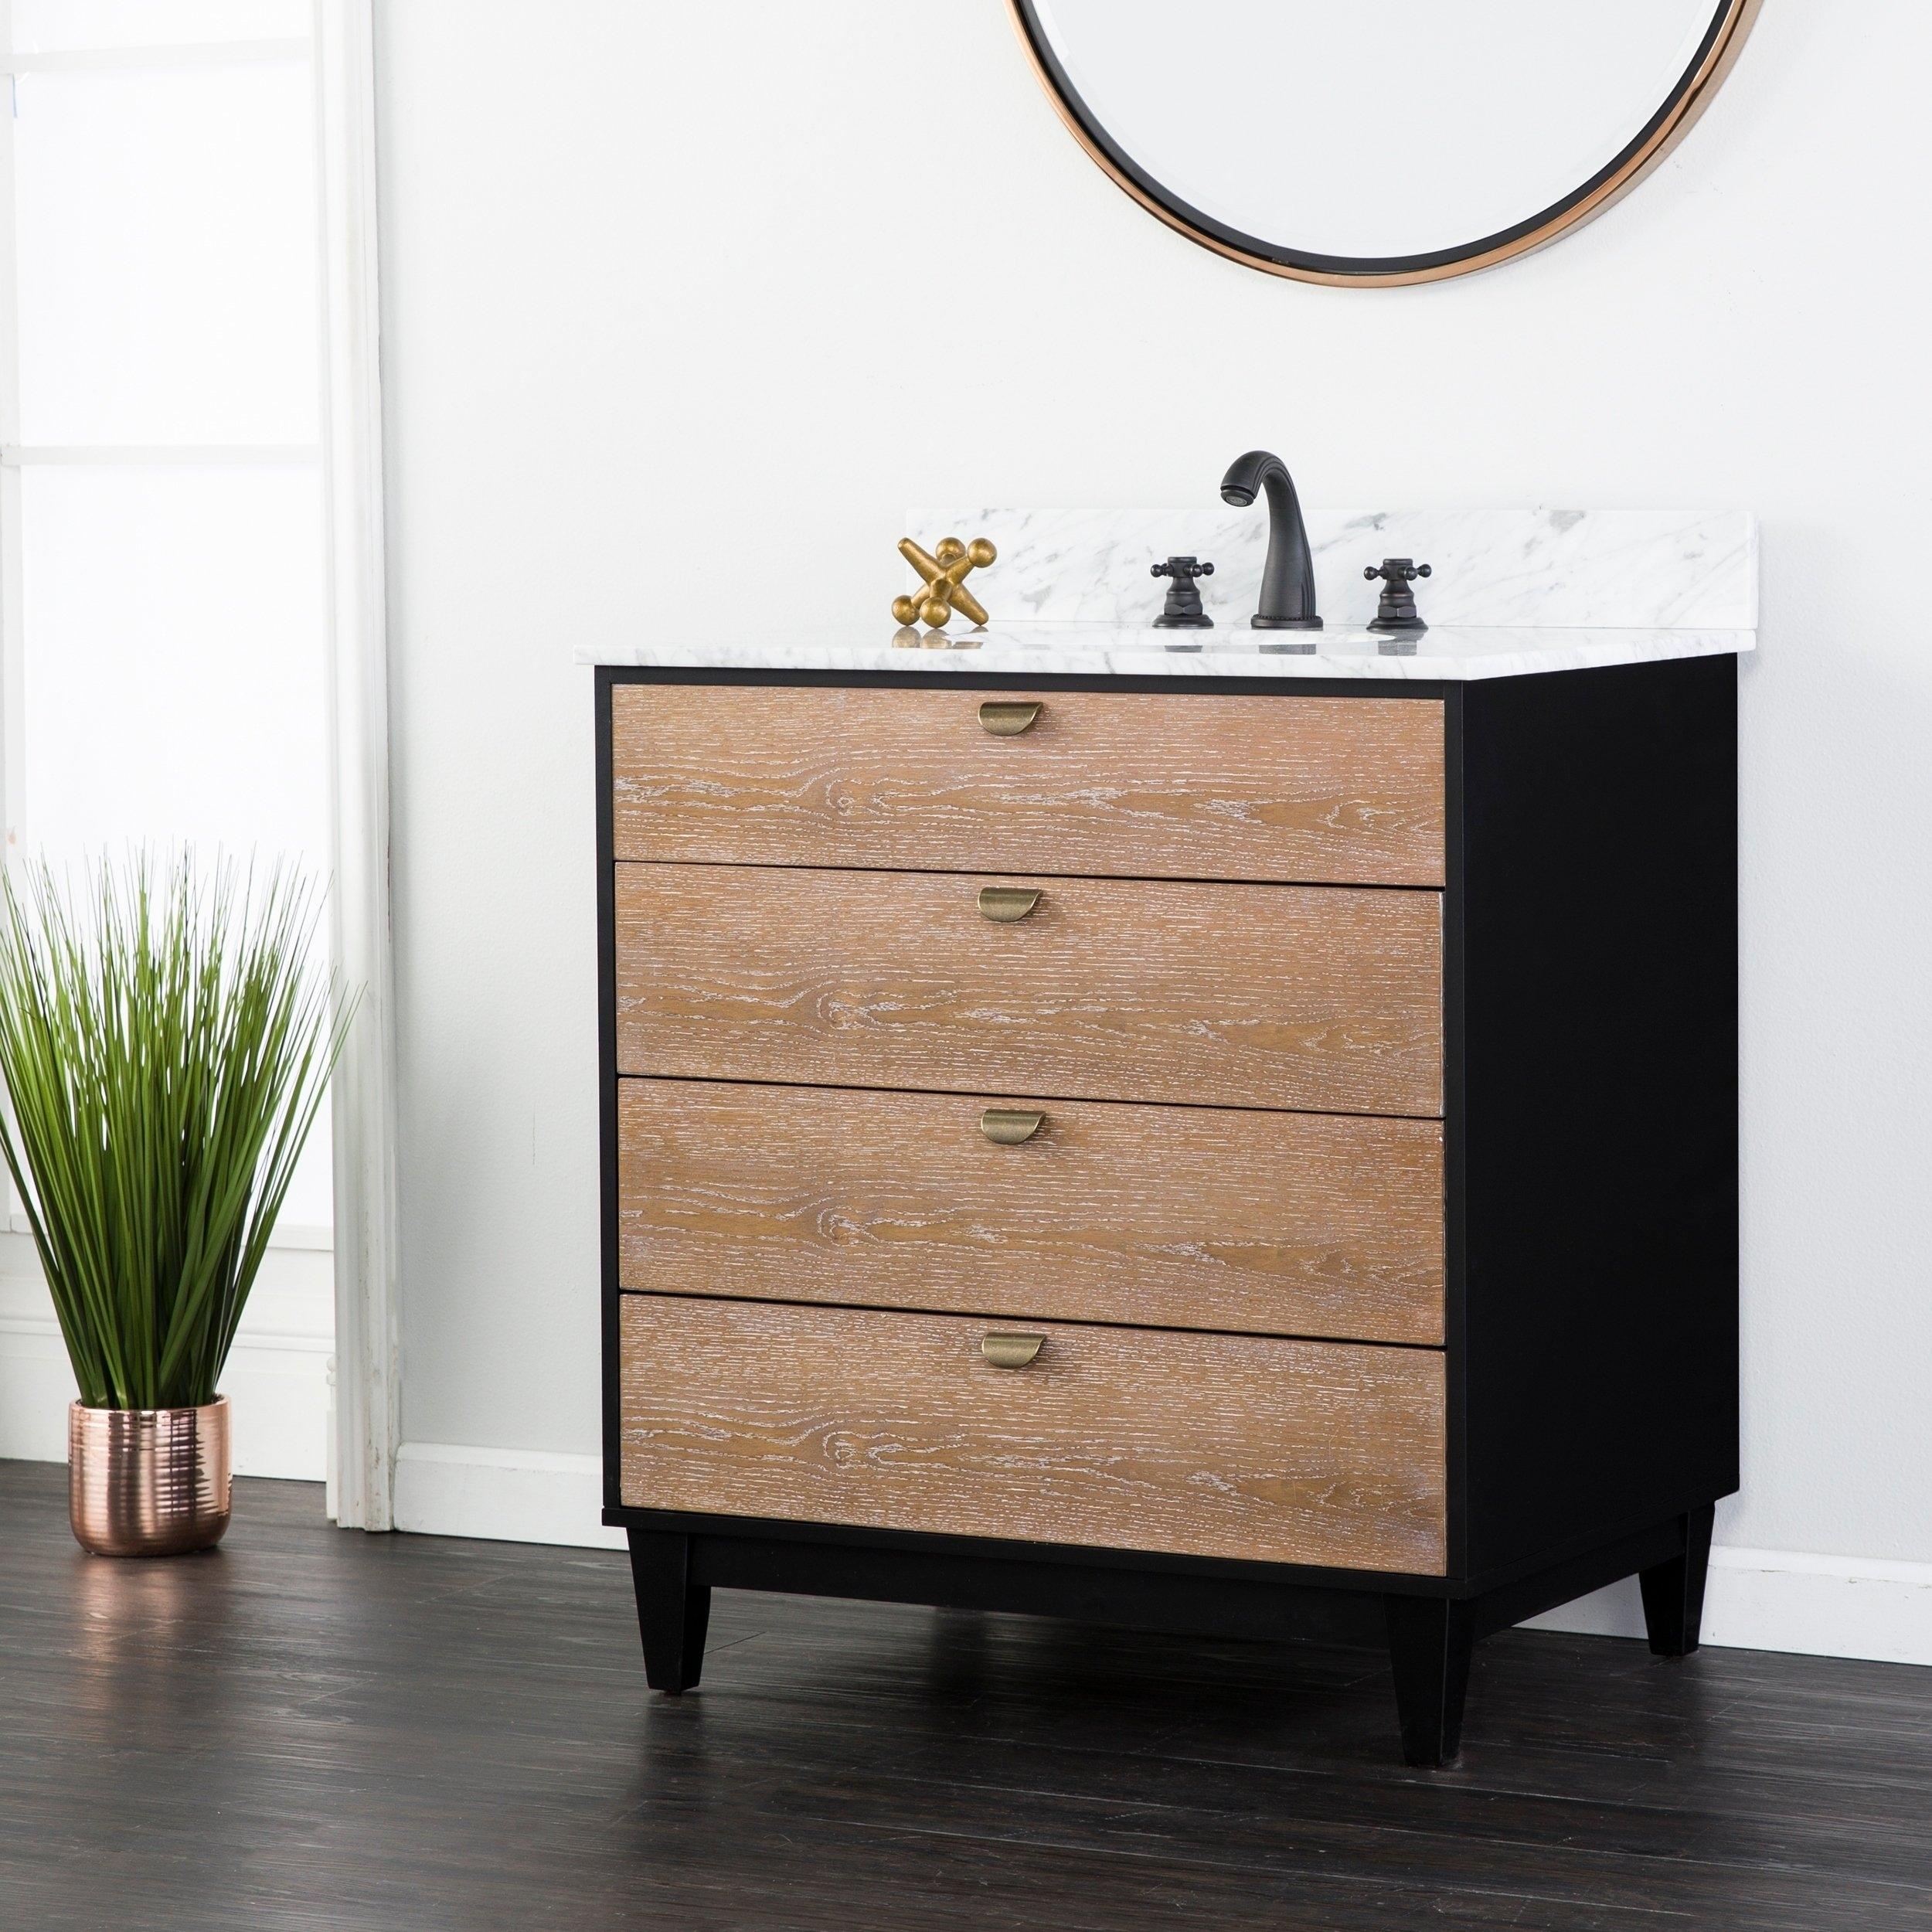 Shop Holly & Martin Tobin Limed Burnt Oak W/ Marble Bath Vanity Sink For Latest Mid Burnt Oak 71 Inch Sideboards (View 8 of 20)